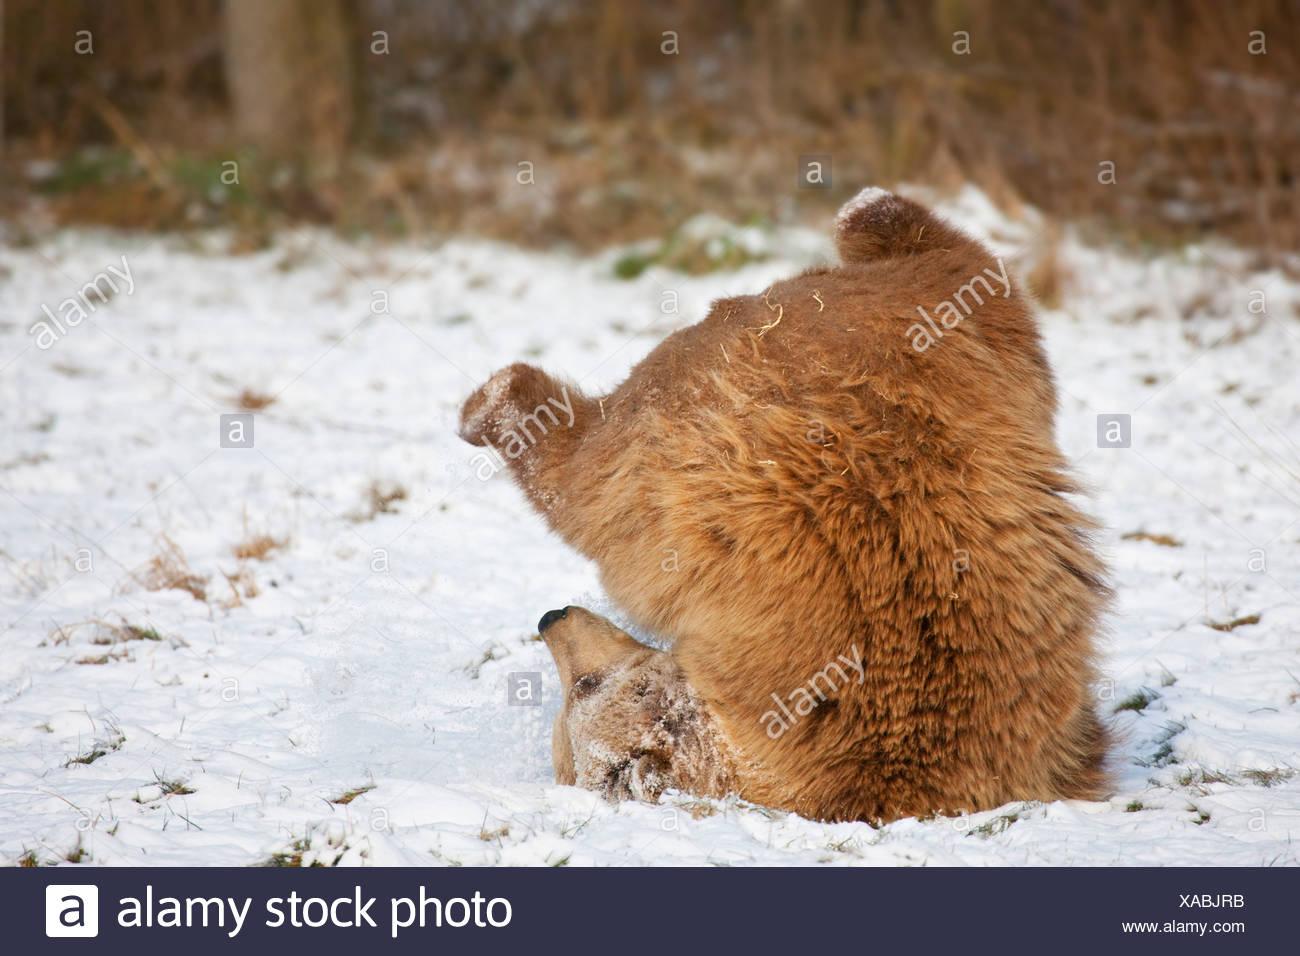 Bavaria, European brown bear in snow - Stock Image